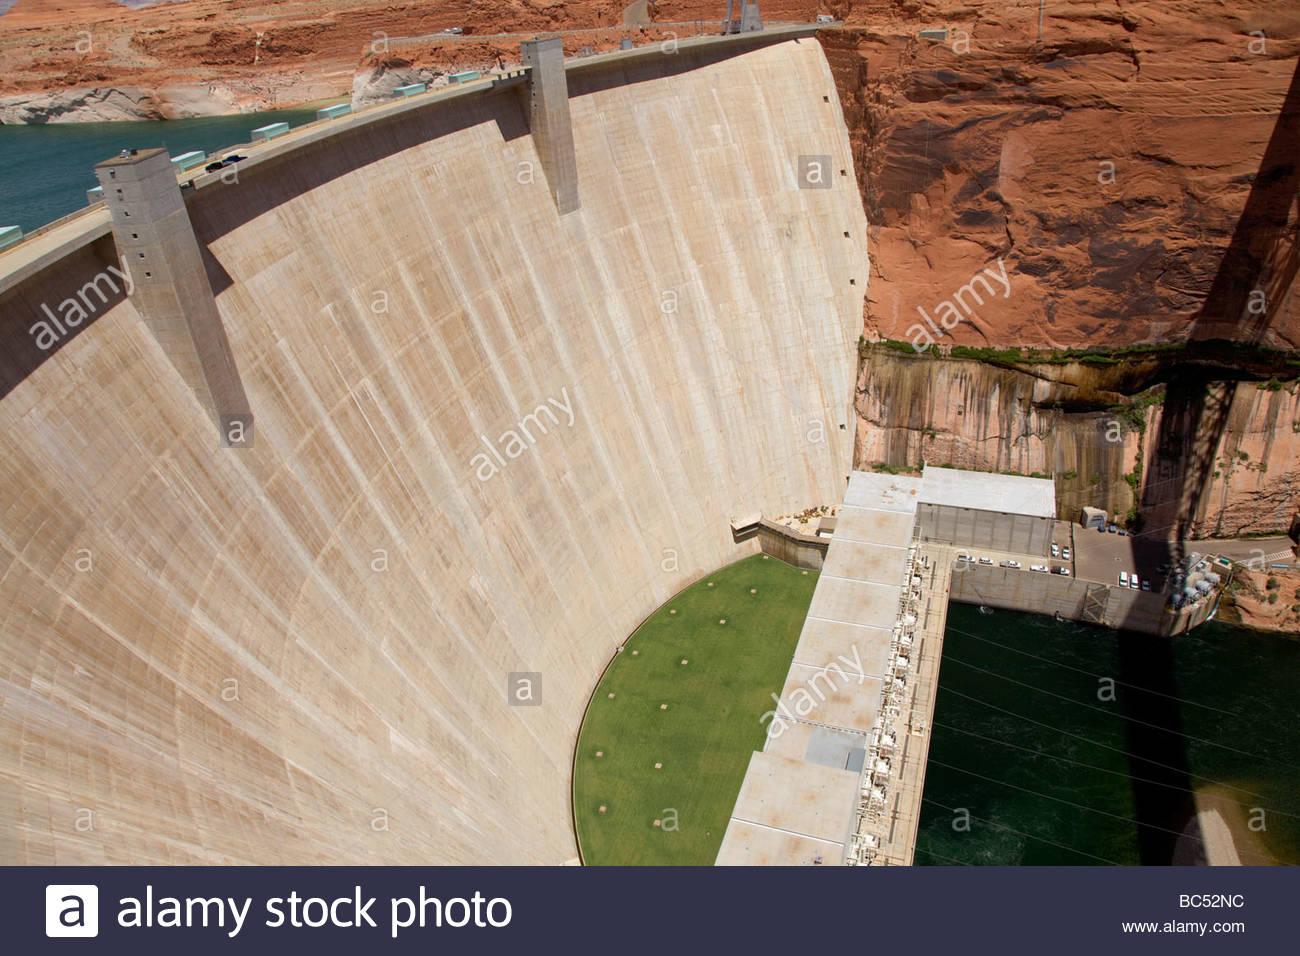 Glen Canyon Dam Arizona powerplant - Stock Image